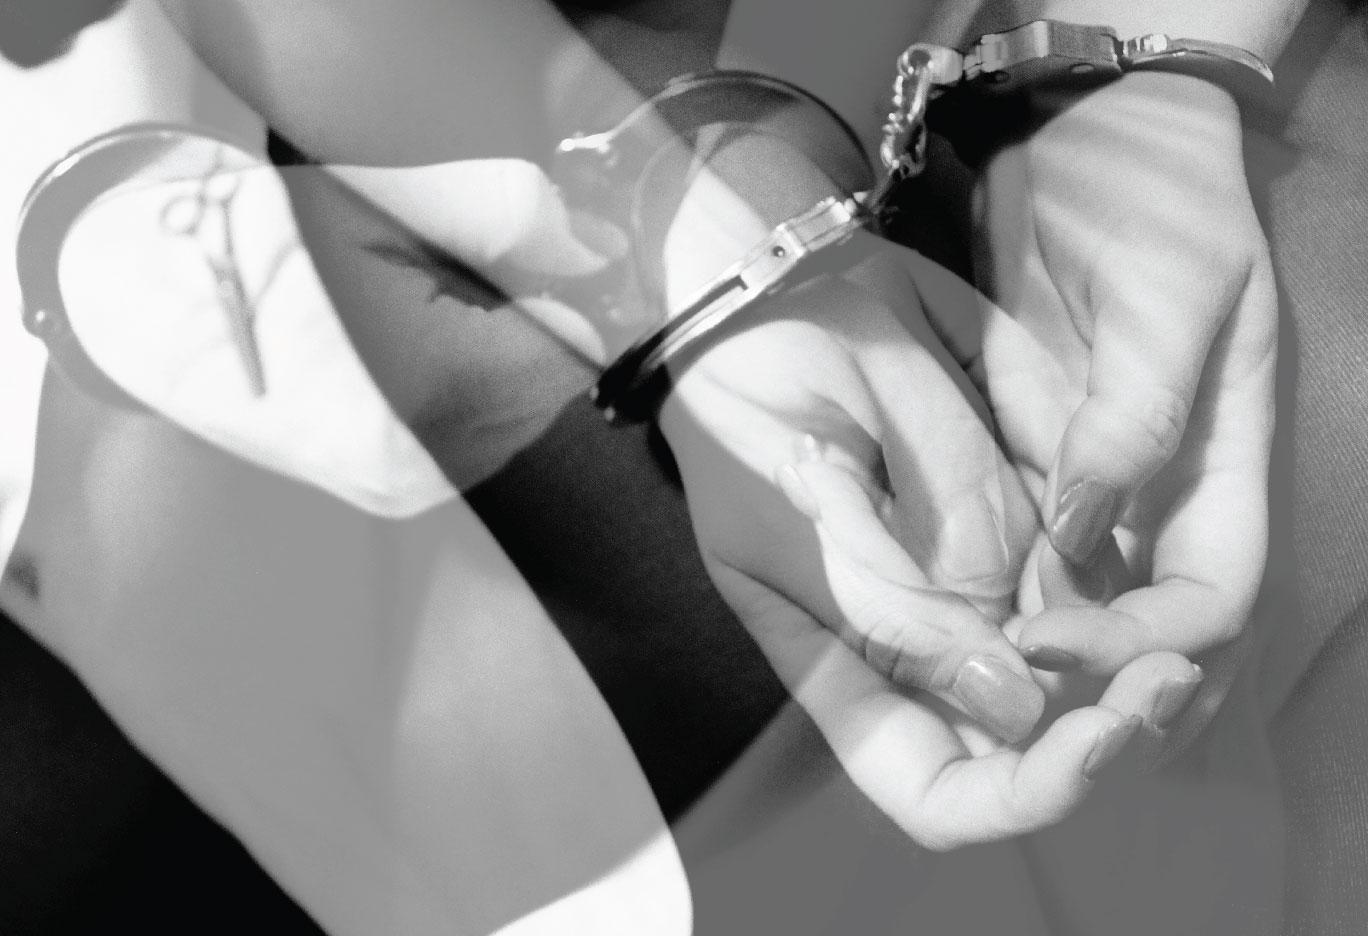 ChrisAlexakis_Handcuffs.jpg